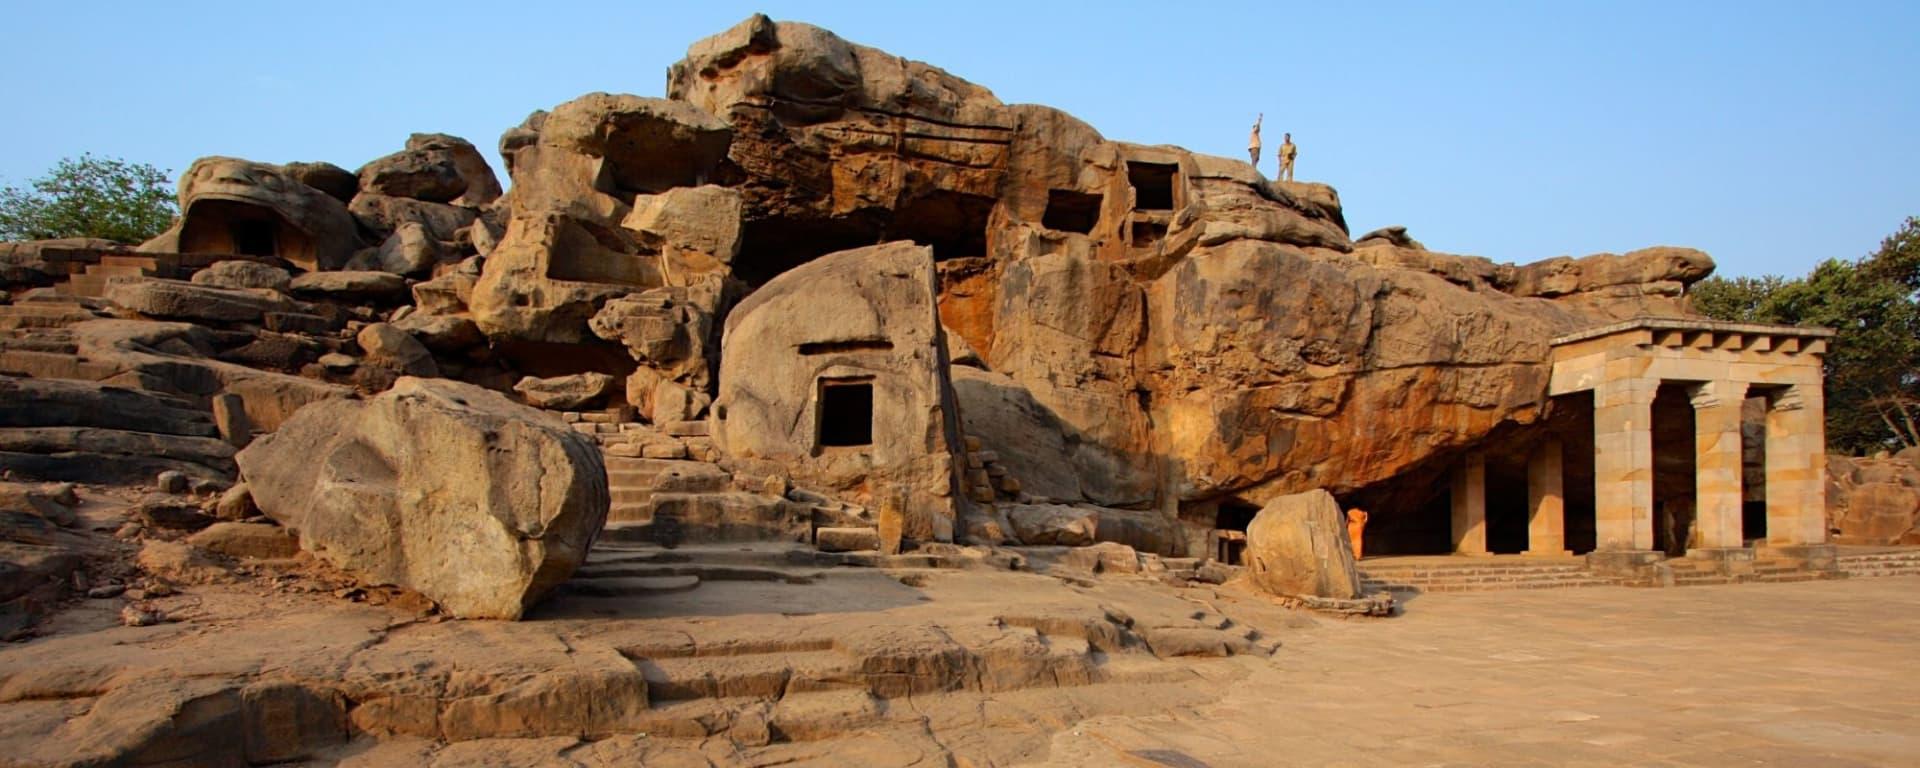 Odisha, terre des temples de Bhubaneswar: Khandagiri